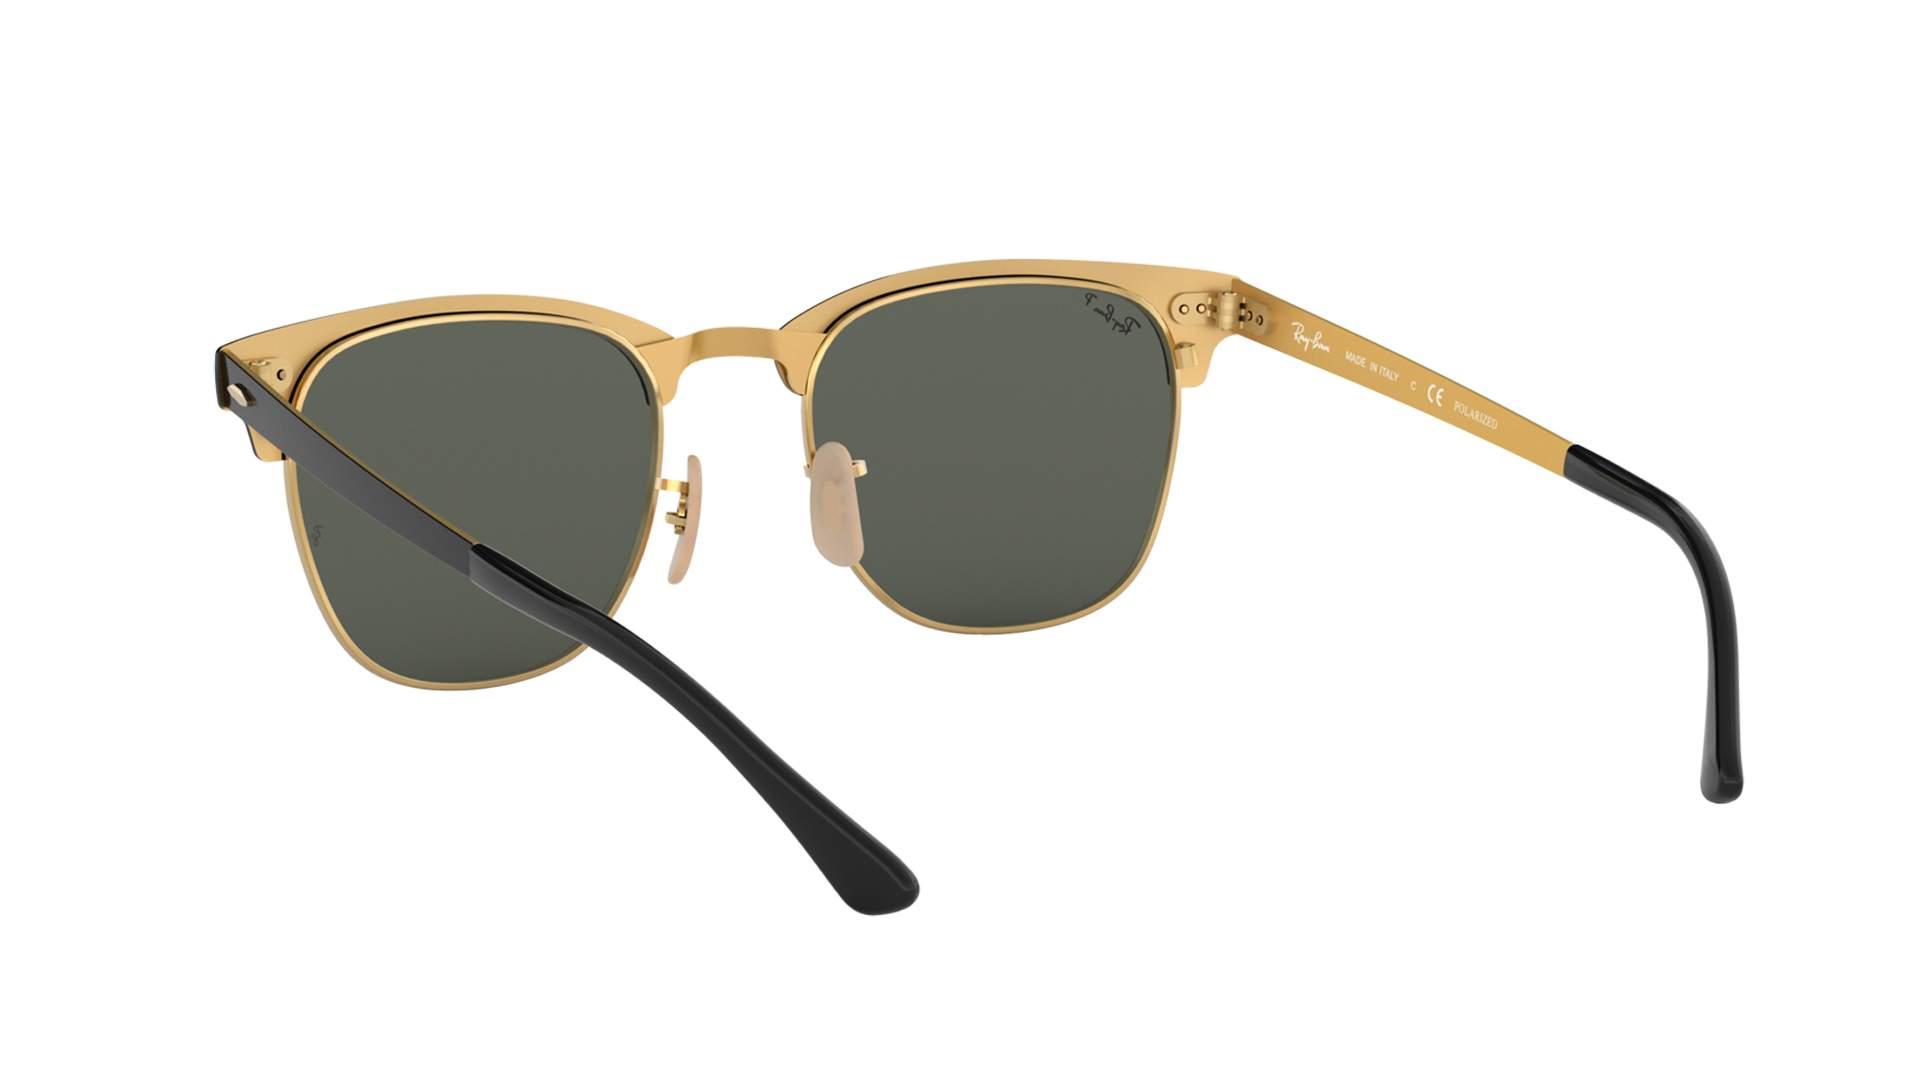 Ray Ban CLUBMASTER METAL RB3716 186R5 | Sunglasses